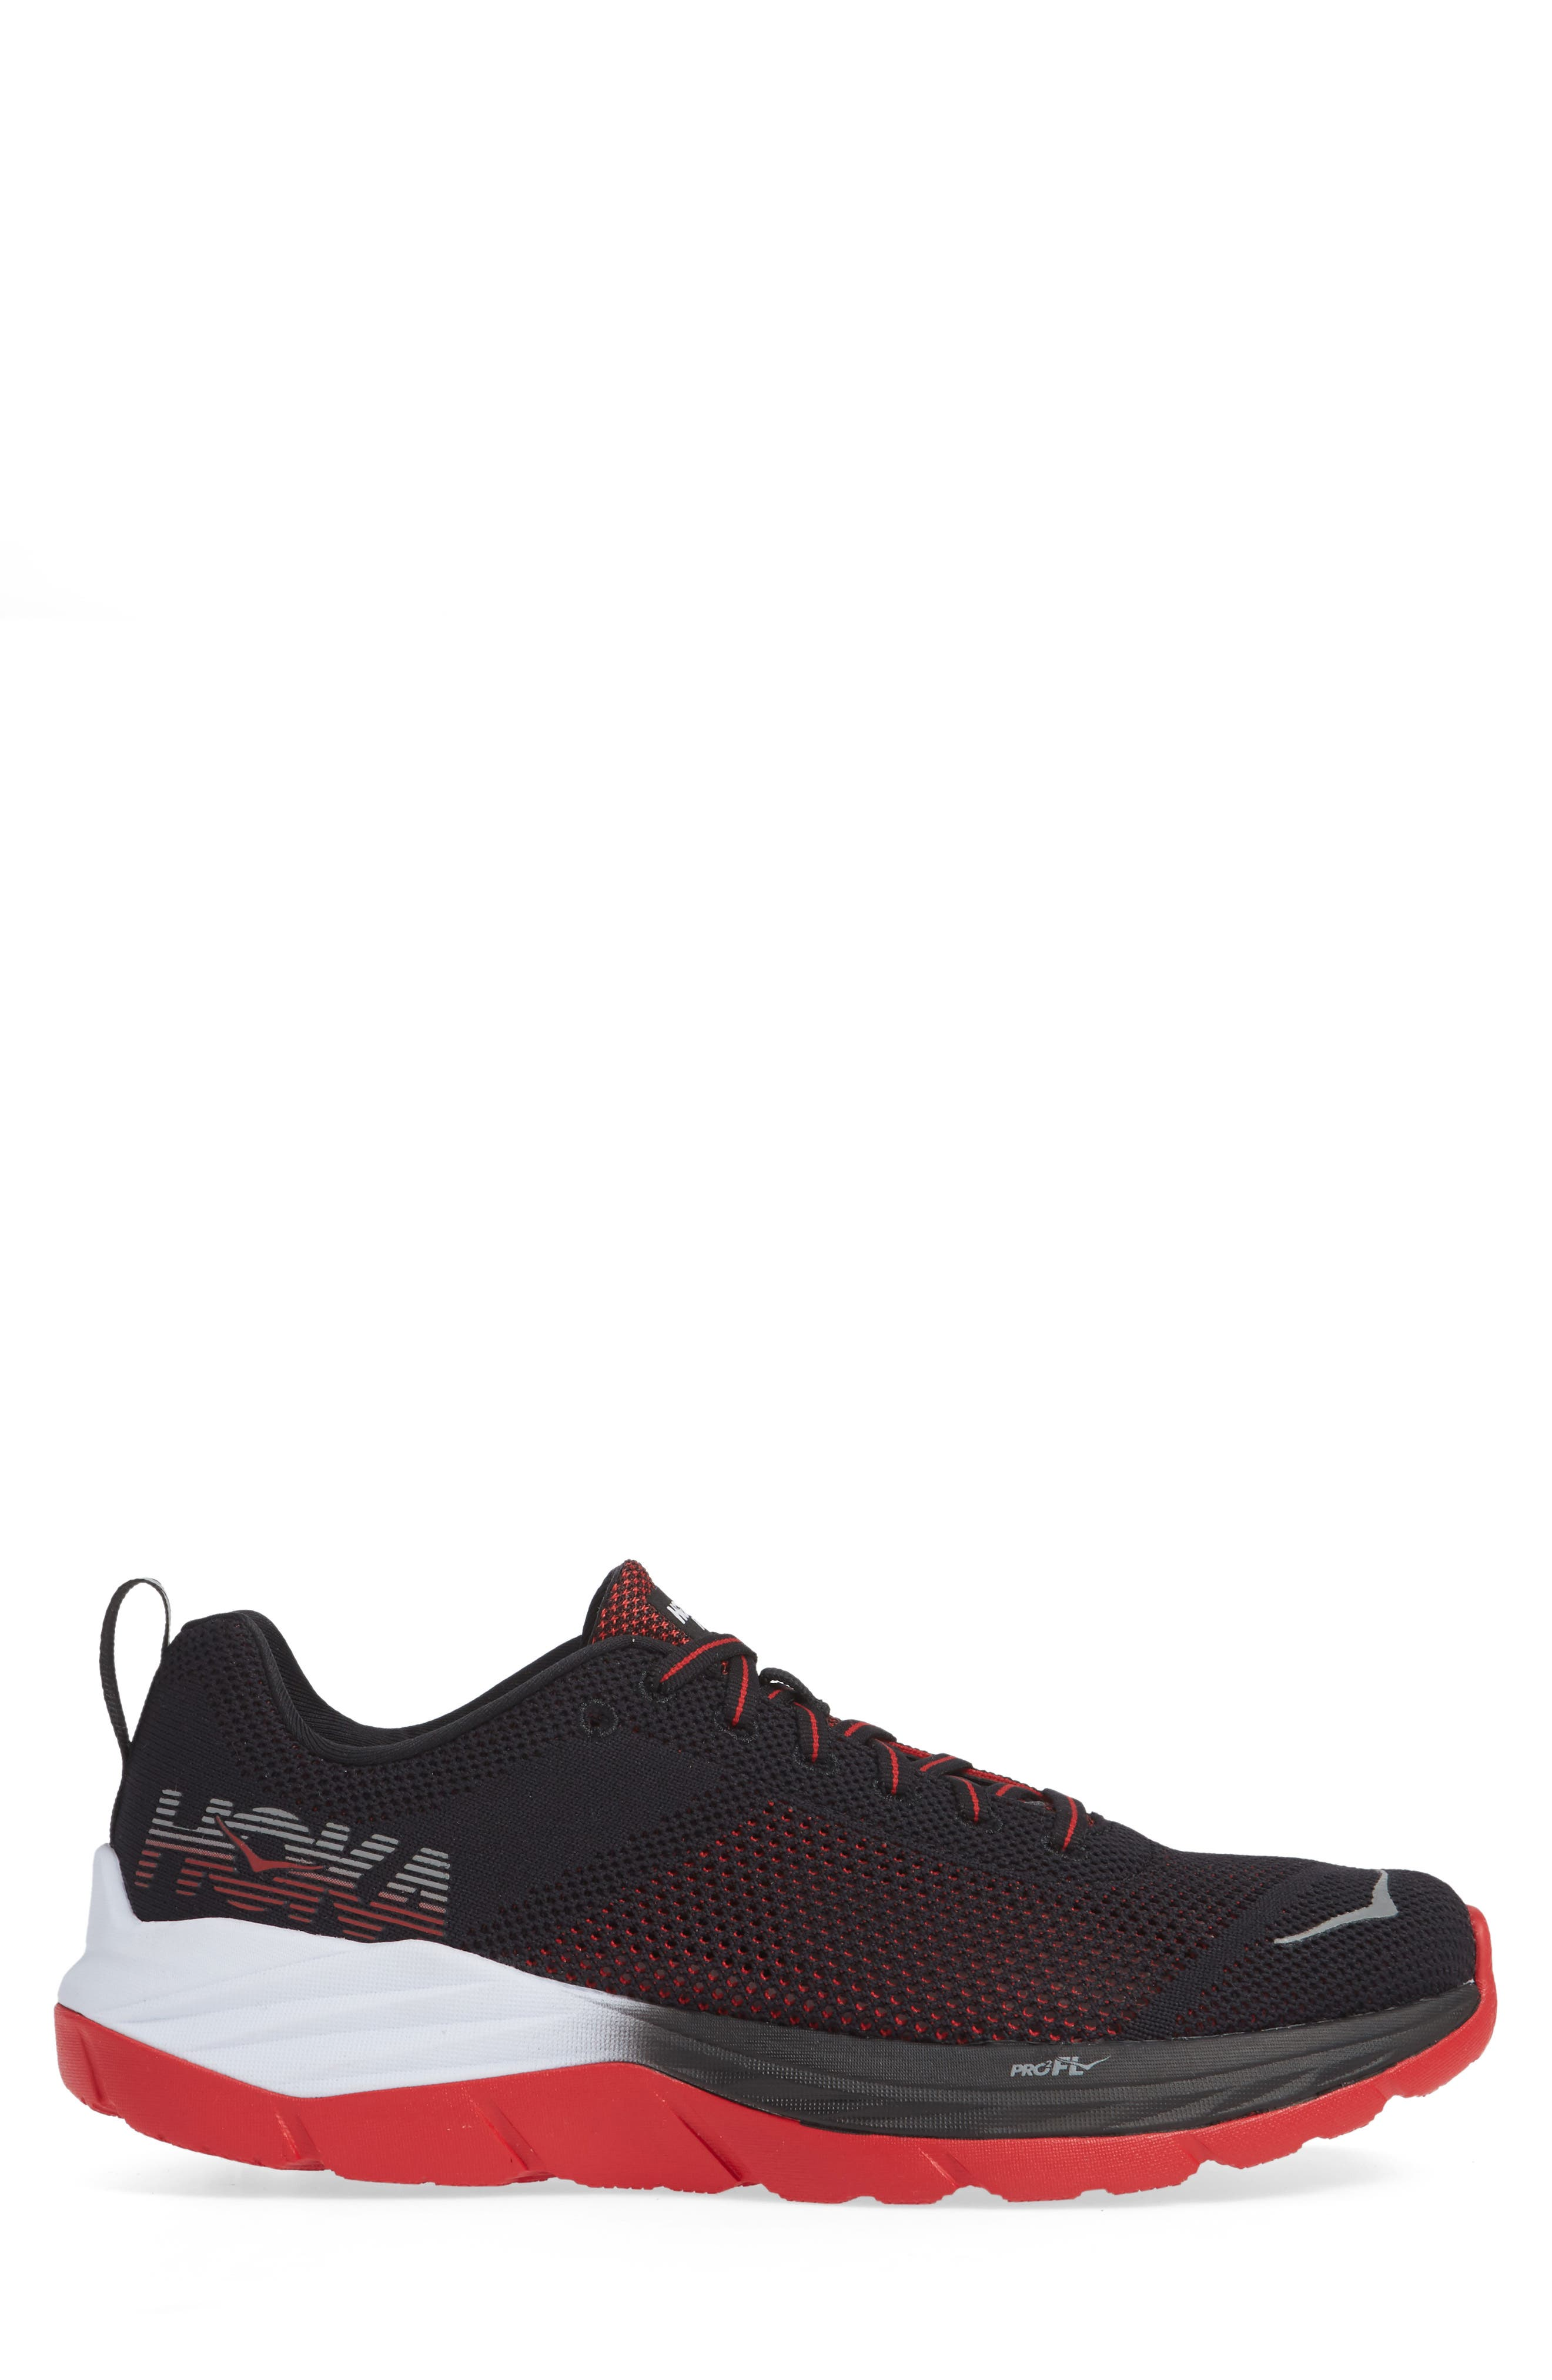 Mach Running Shoe,                             Alternate thumbnail 3, color,                             007